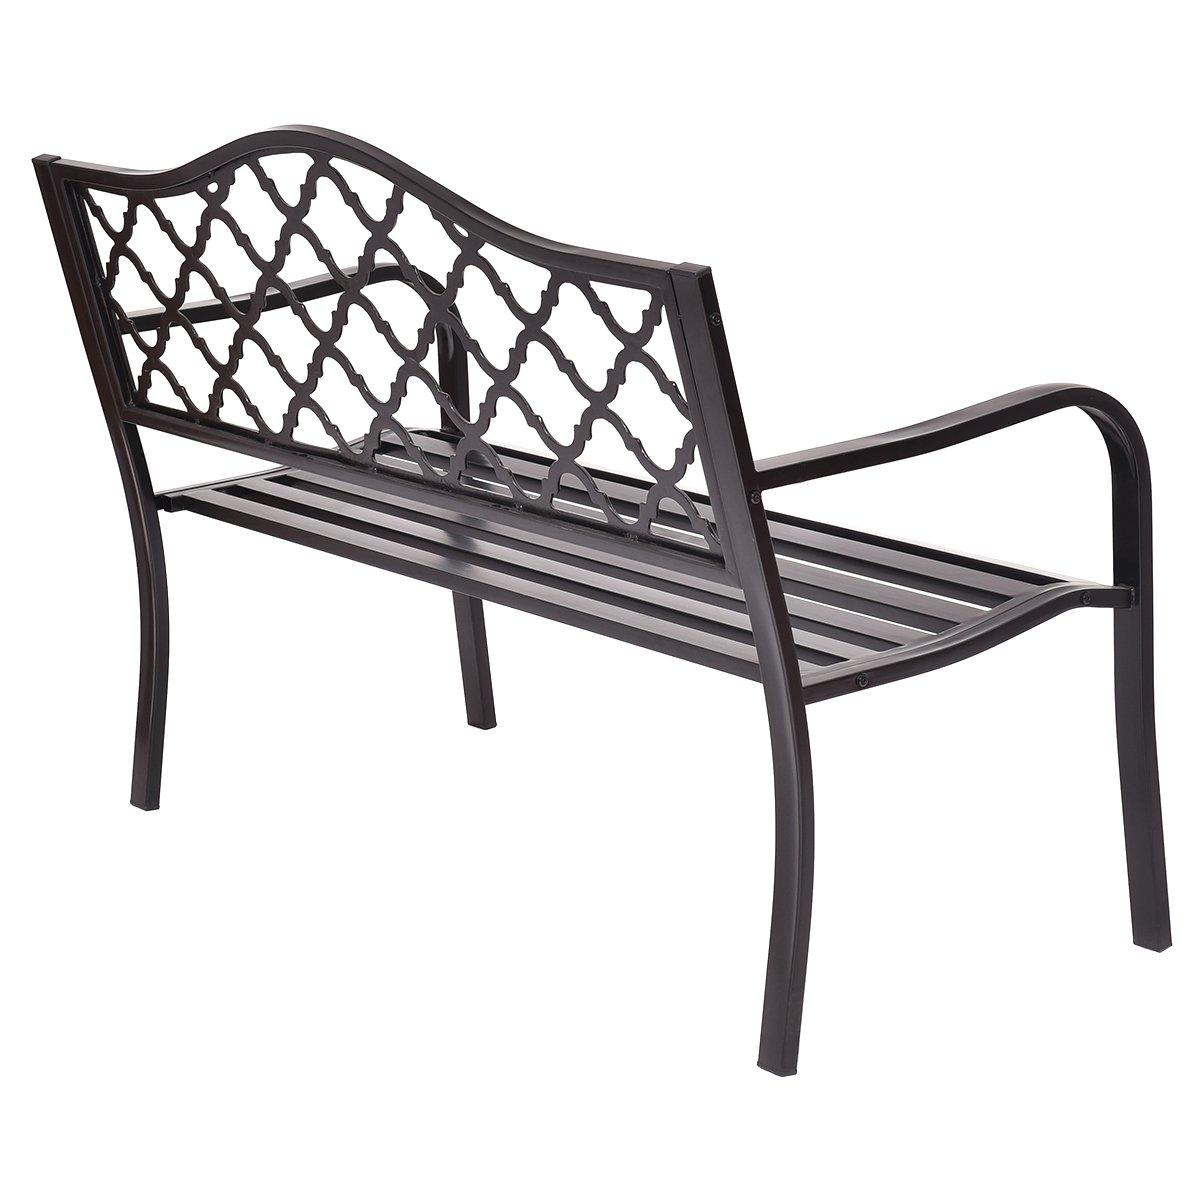 Giantex 50'' Patio Garden Bench Loveseats Park Yard Furniture Decor Cast Iron Frame Black (Black Style 1) by Giantex (Image #4)